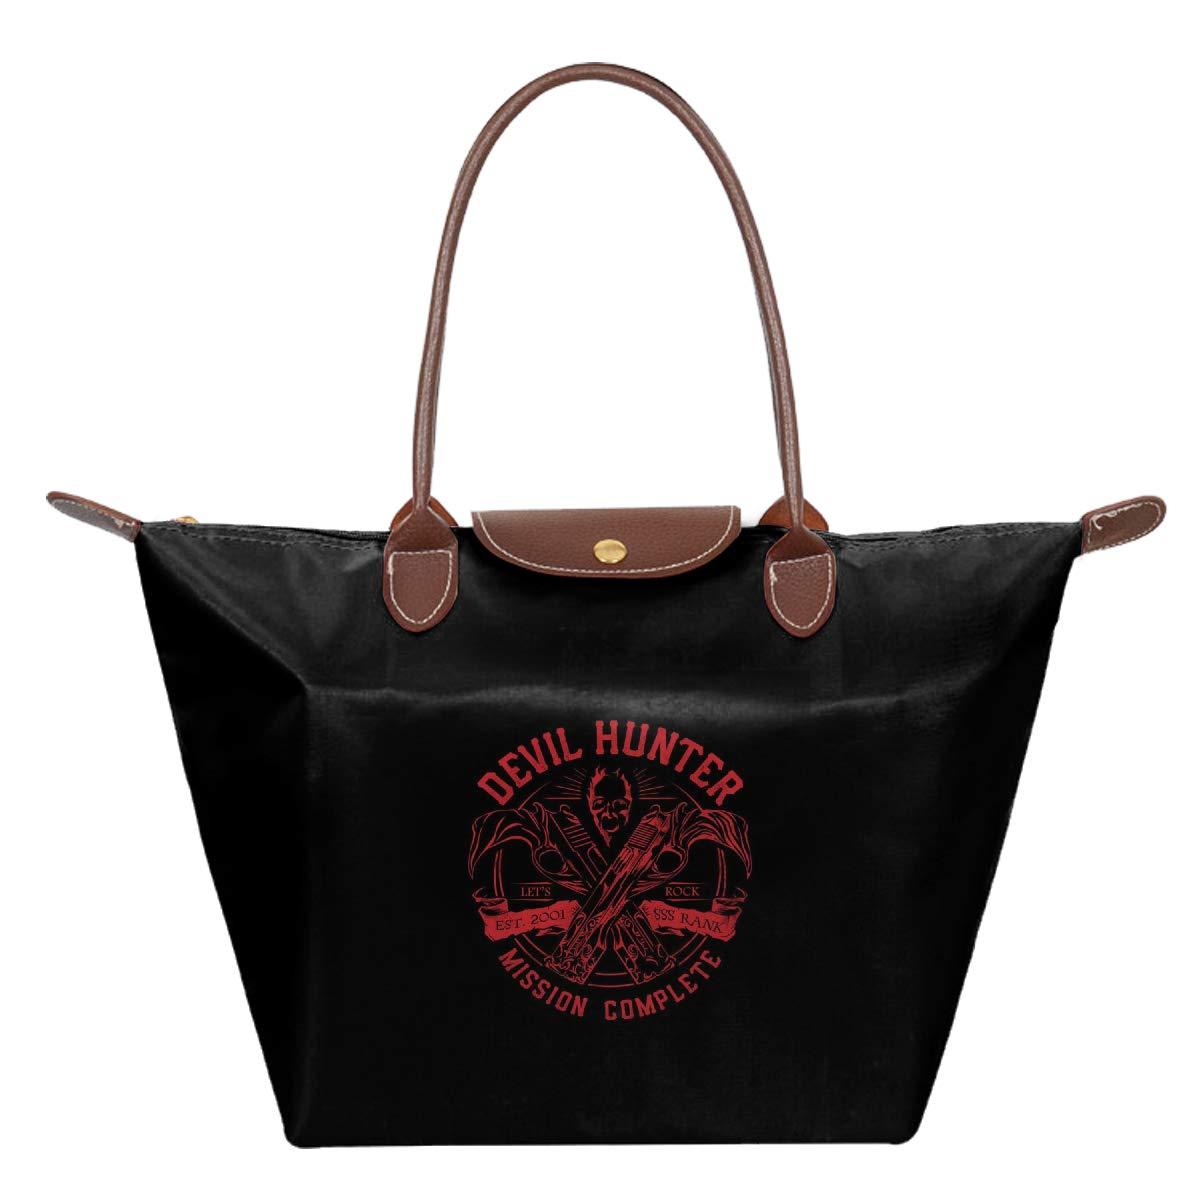 Devil Hunter Ebony And Ivory DMC Waterproof Leather Folded Messenger Nylon Bag Travel Tote Hopping Folding School Handbags